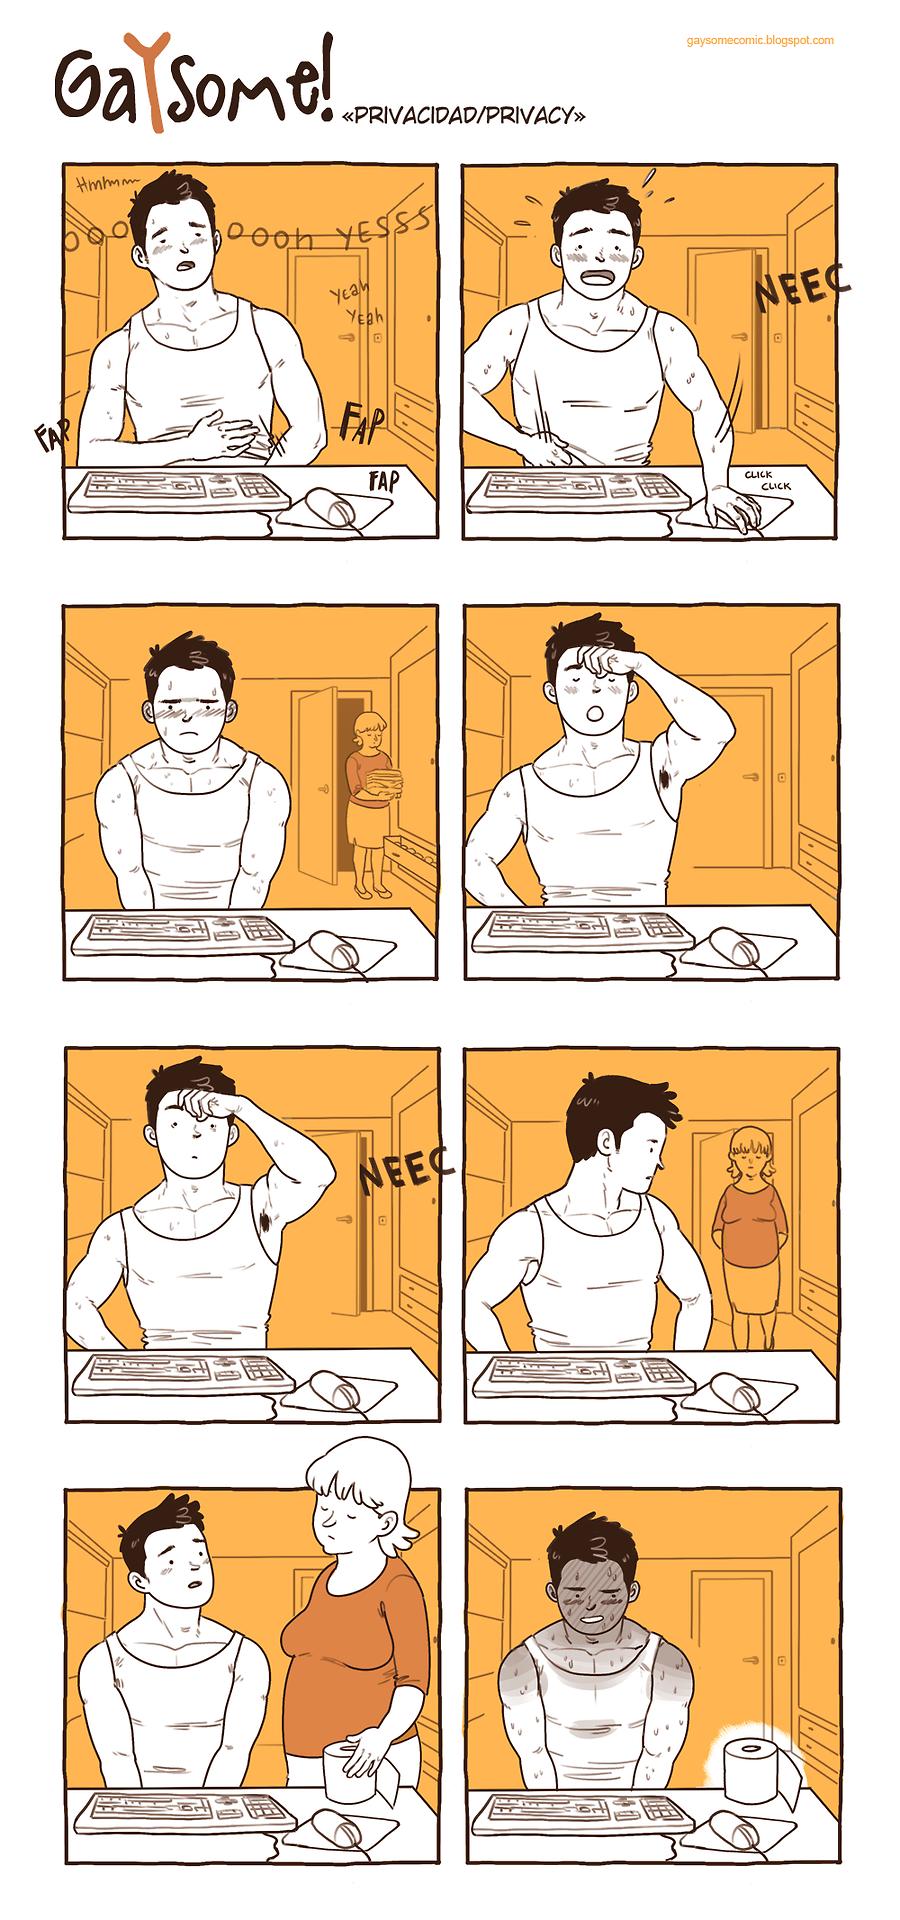 Image Fap Comics Classy gaysome!: photo | gaysome! | pinterest | gay comics and illustrators